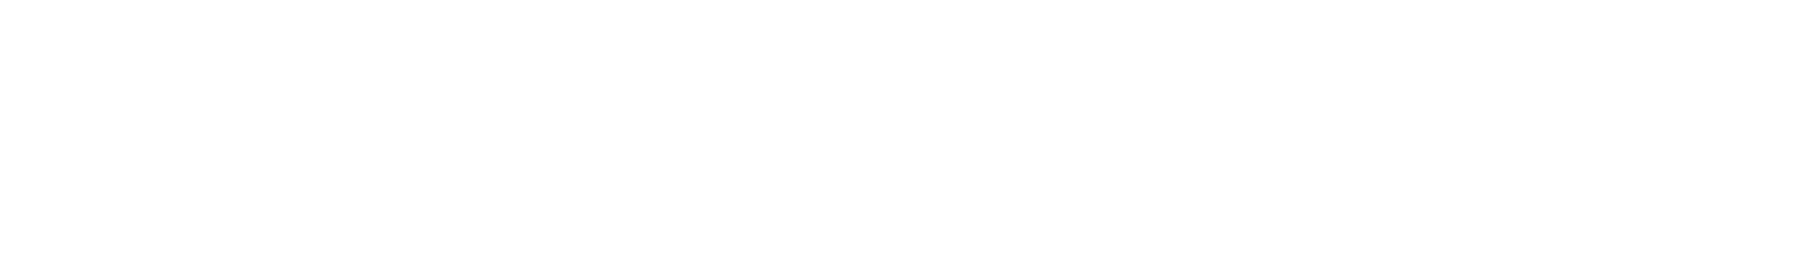 dts chordlp 51b cm wet